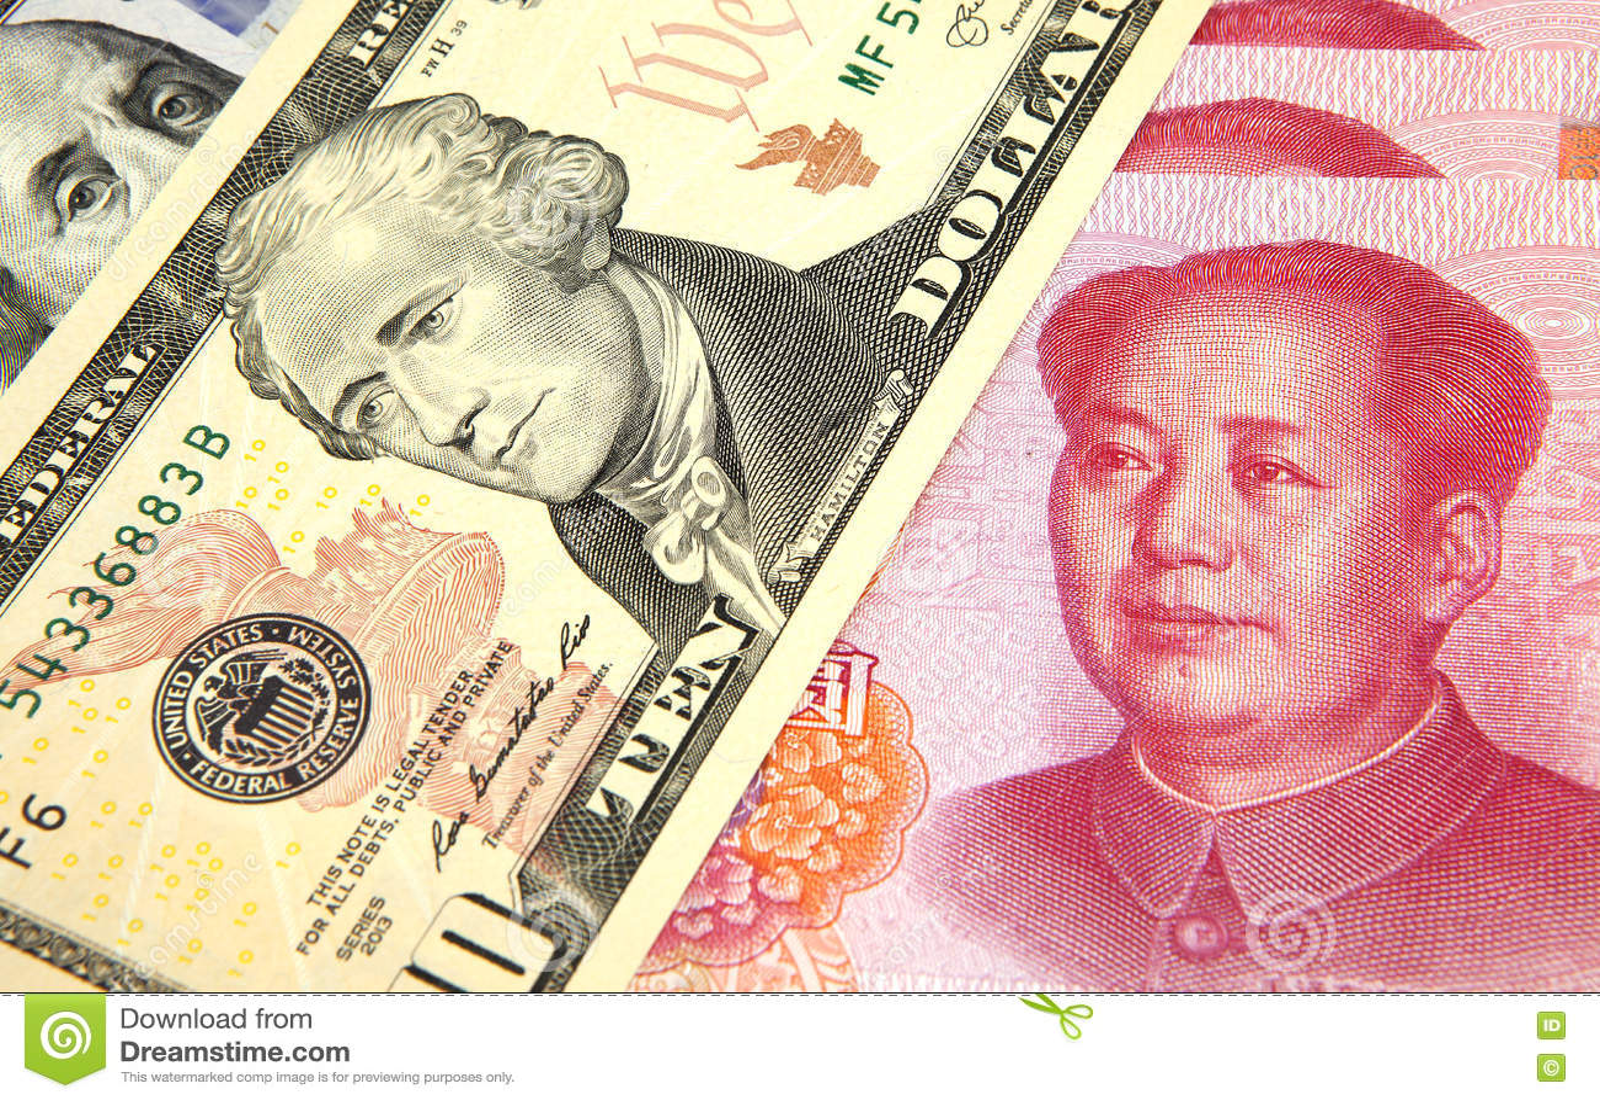 Us dollar vs chinese rmb stock photo image of photography 76562738 us dollar vs chinese rmb biocorpaavc Gallery